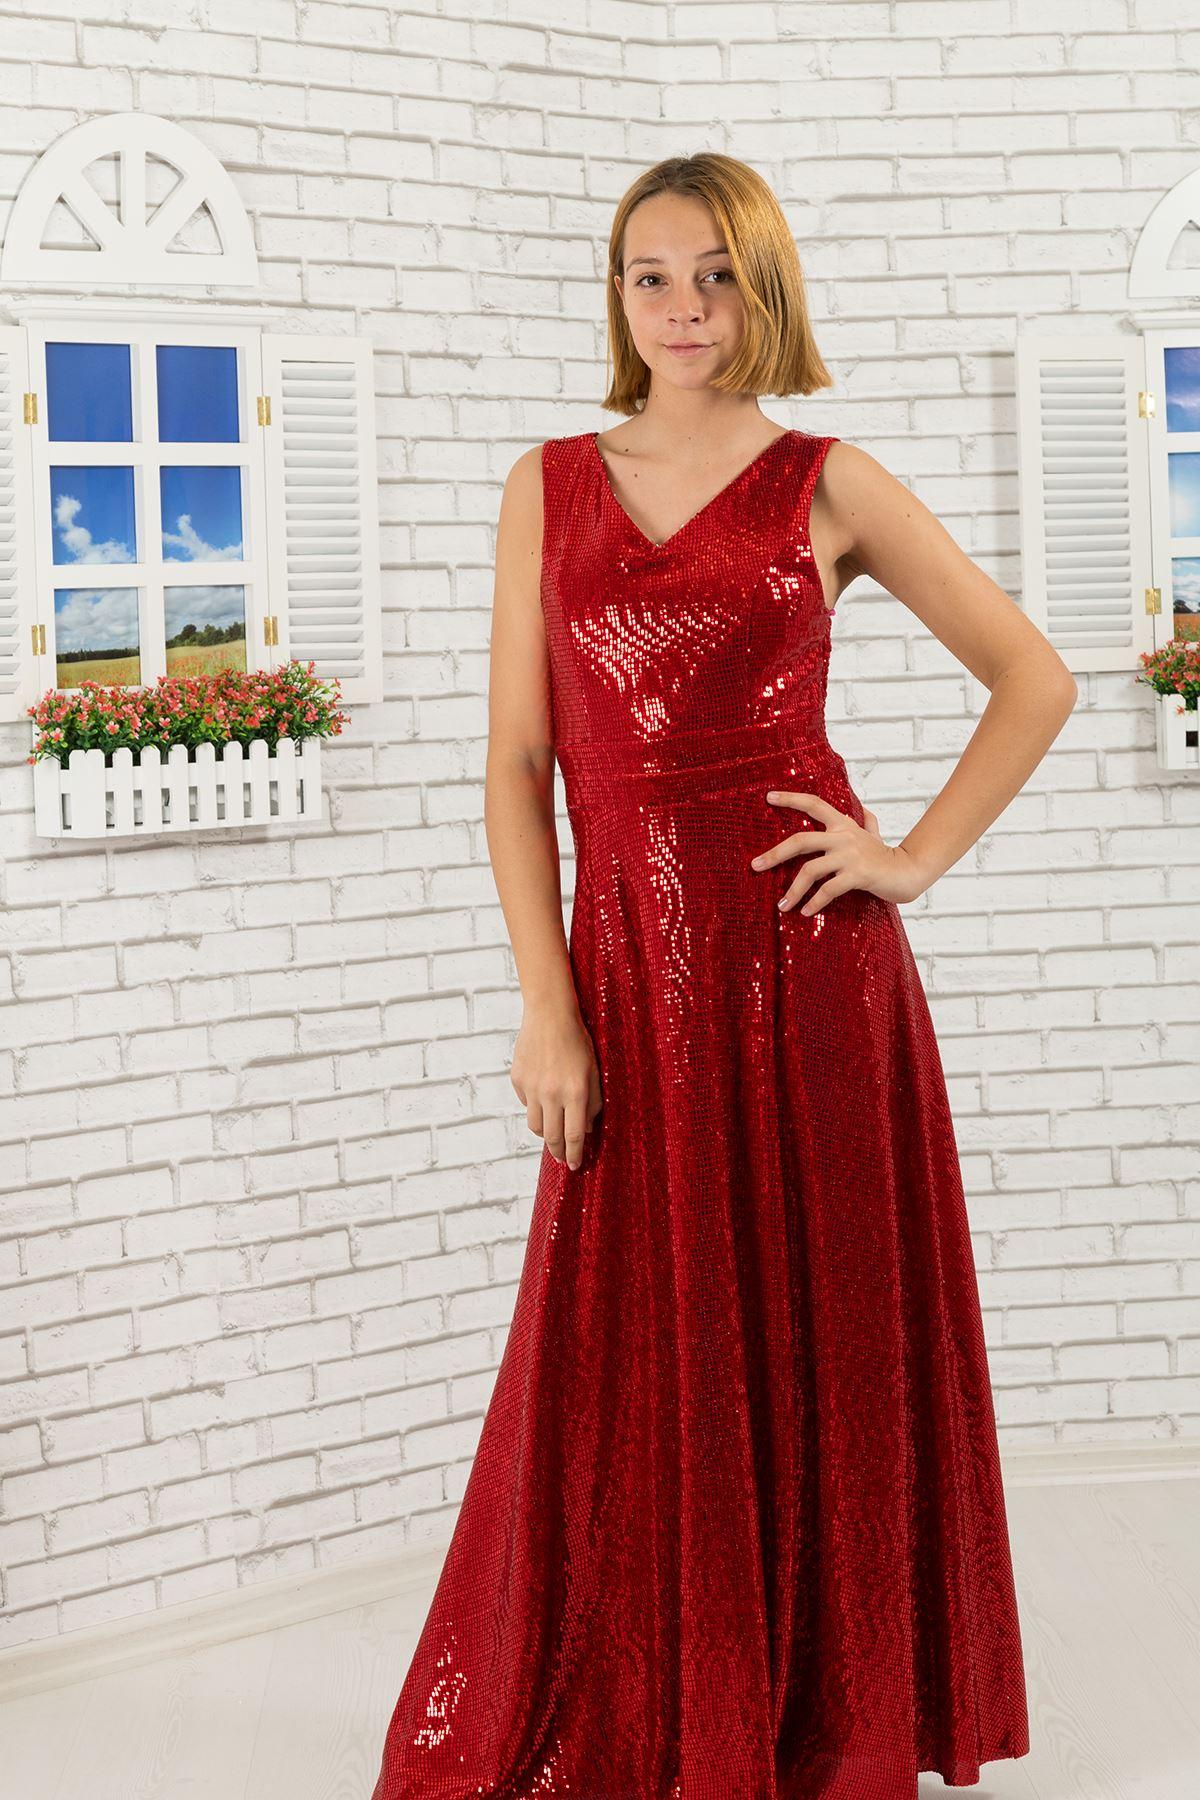 Sequin fabric, v-neck Girl Evening Dress 475 Red